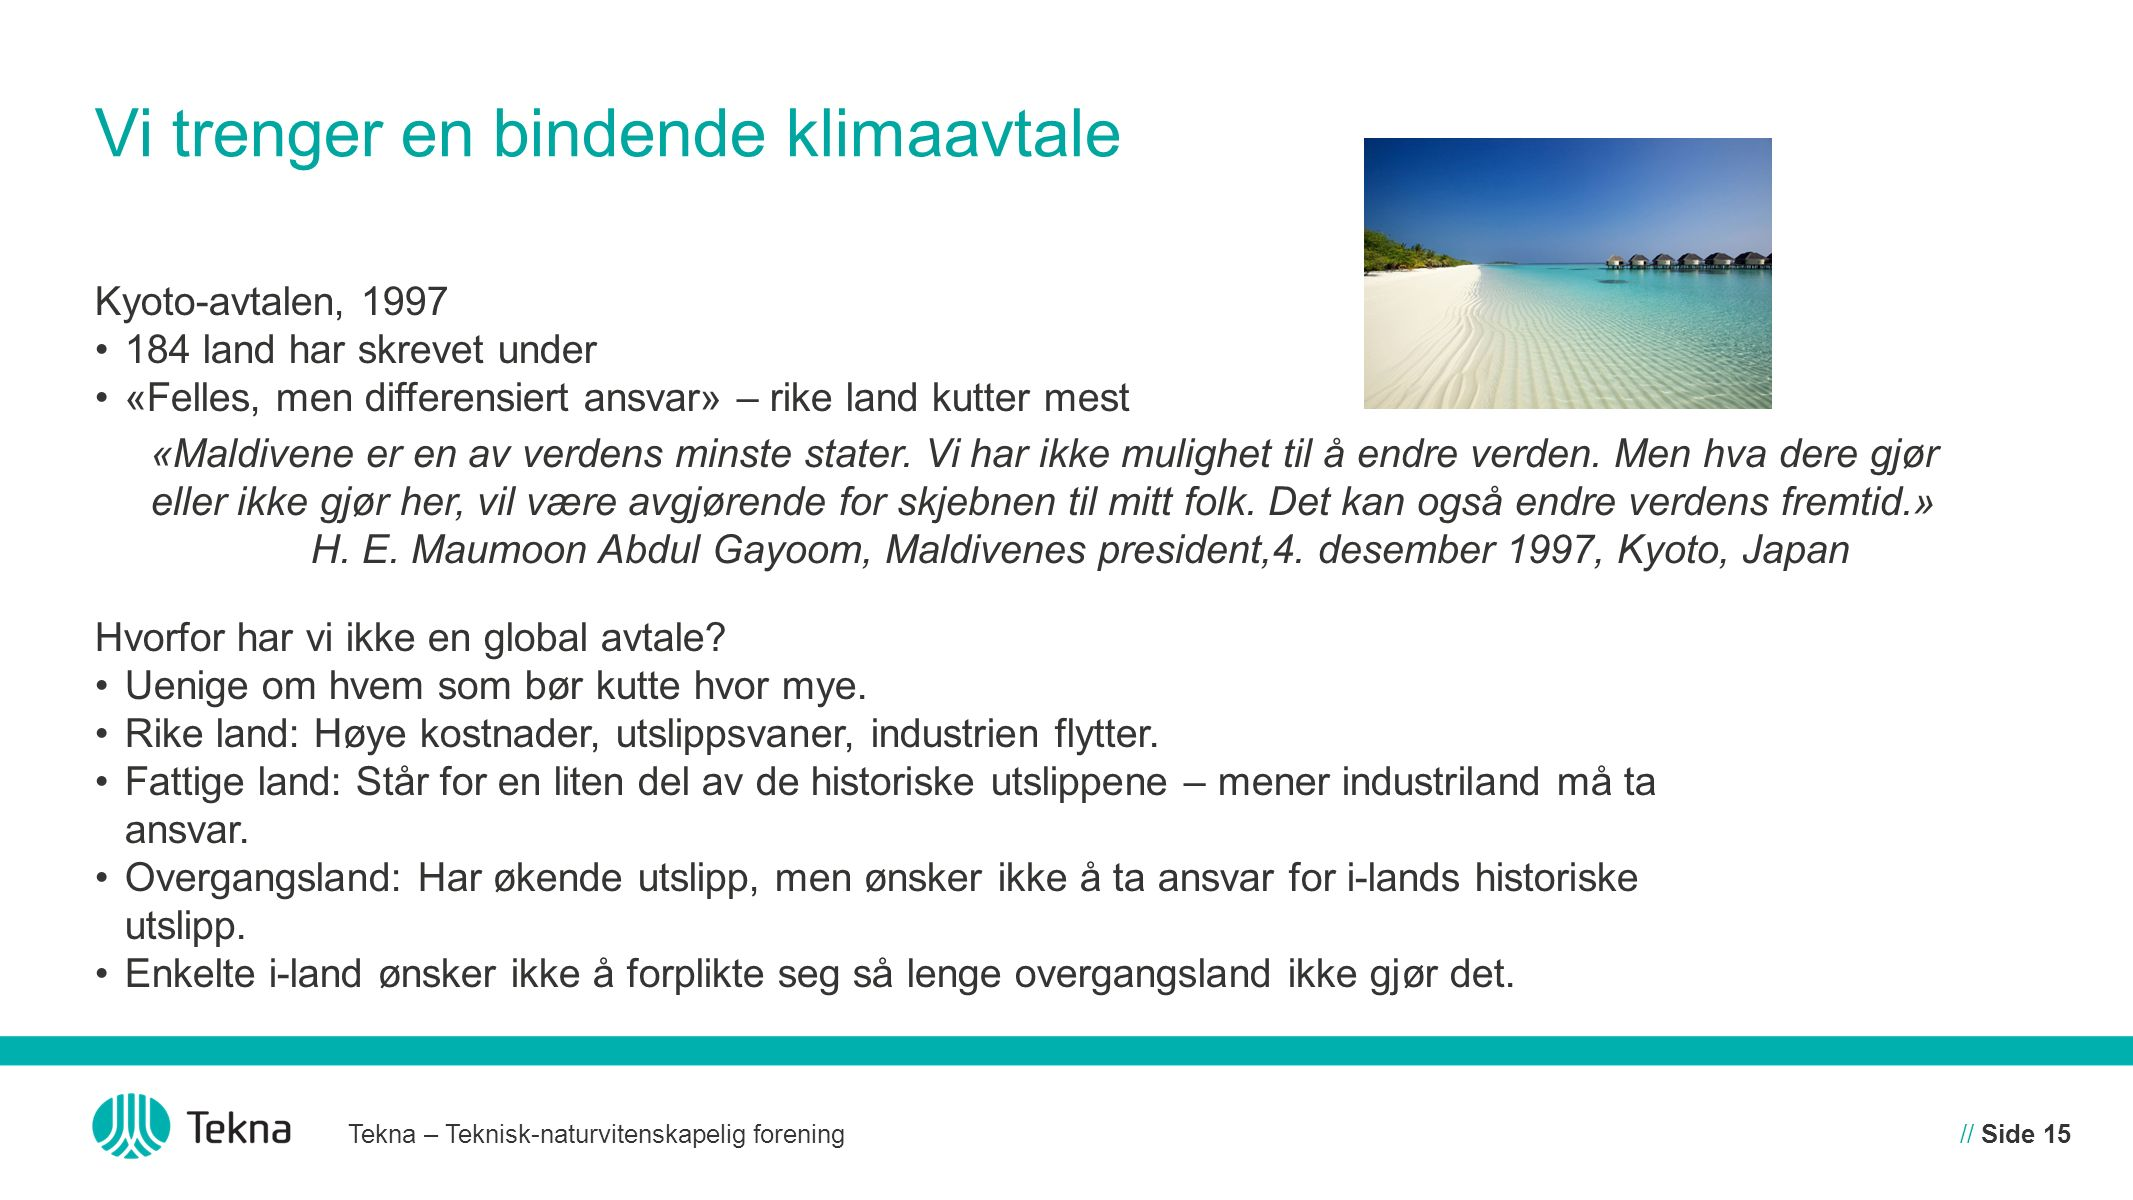 Vi trenger en bindende klimaavtale